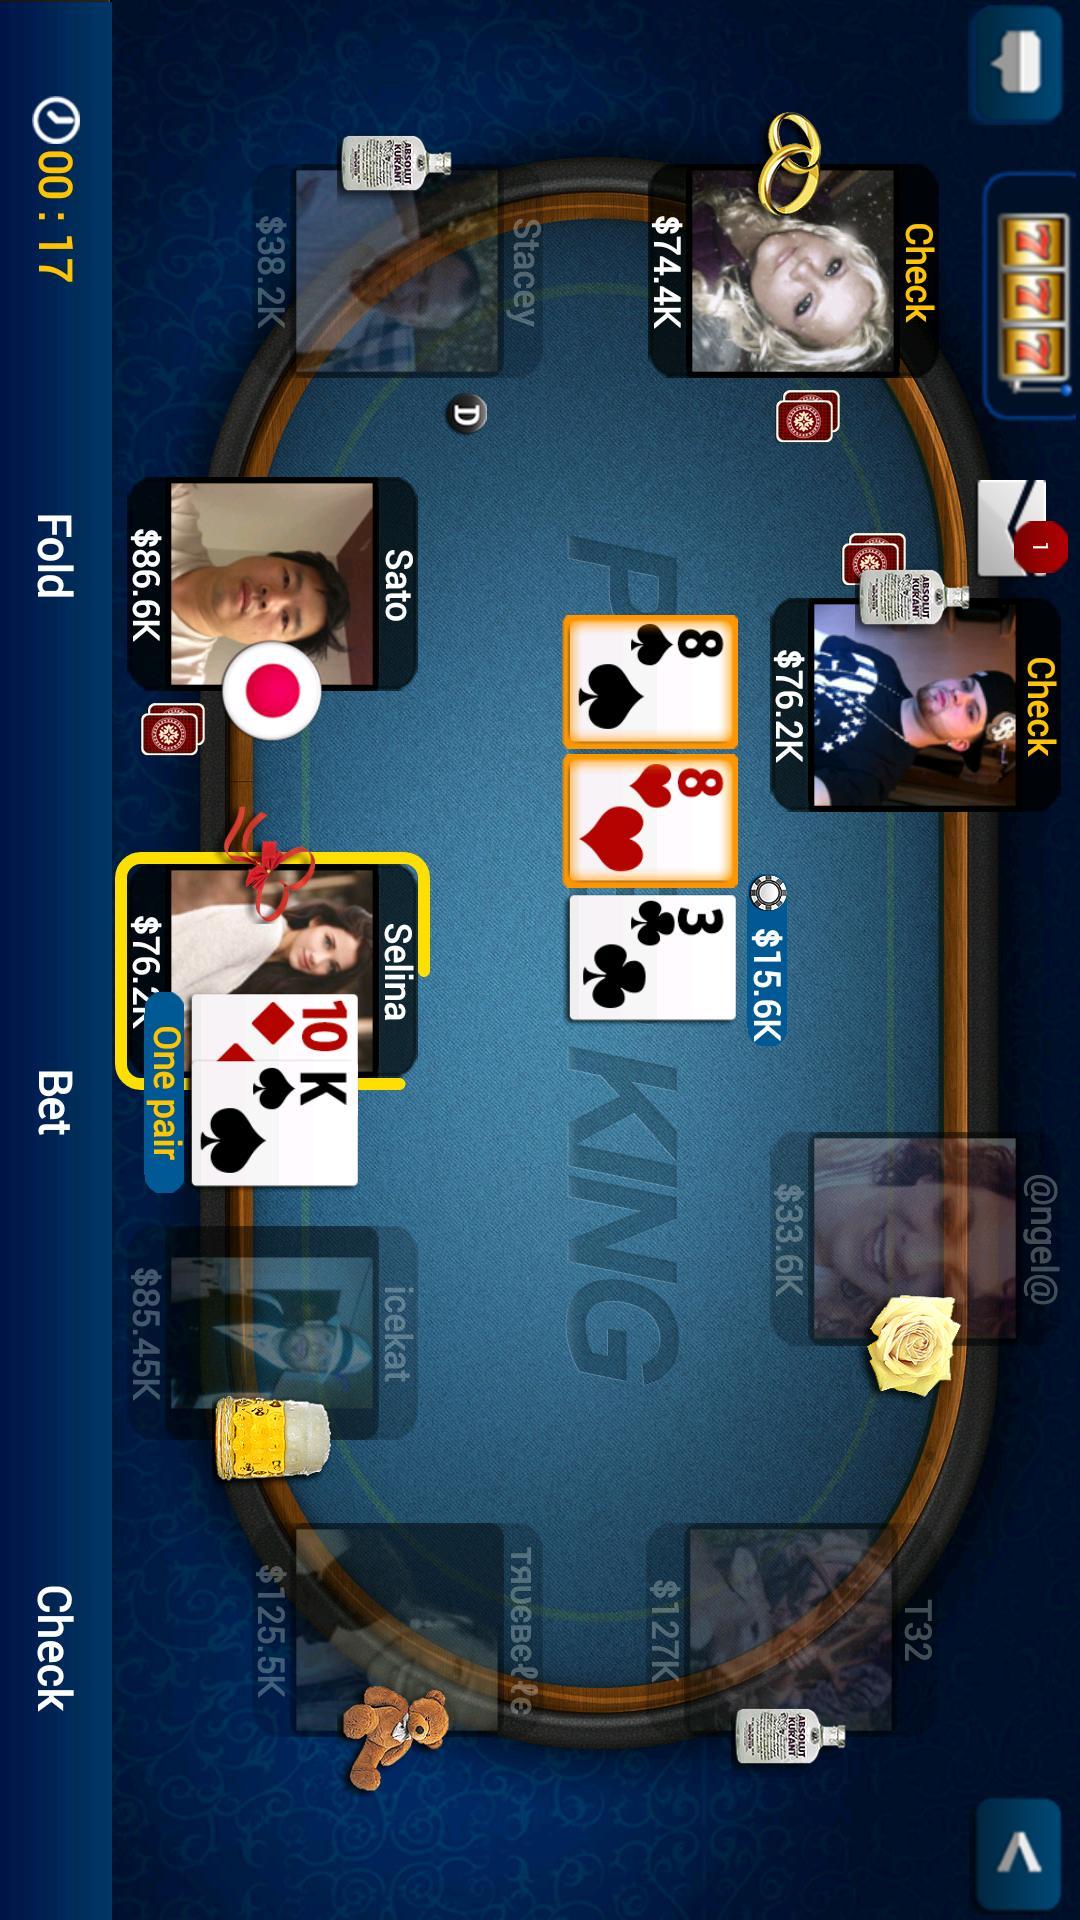 Texas Holdem Poker Spiele Download